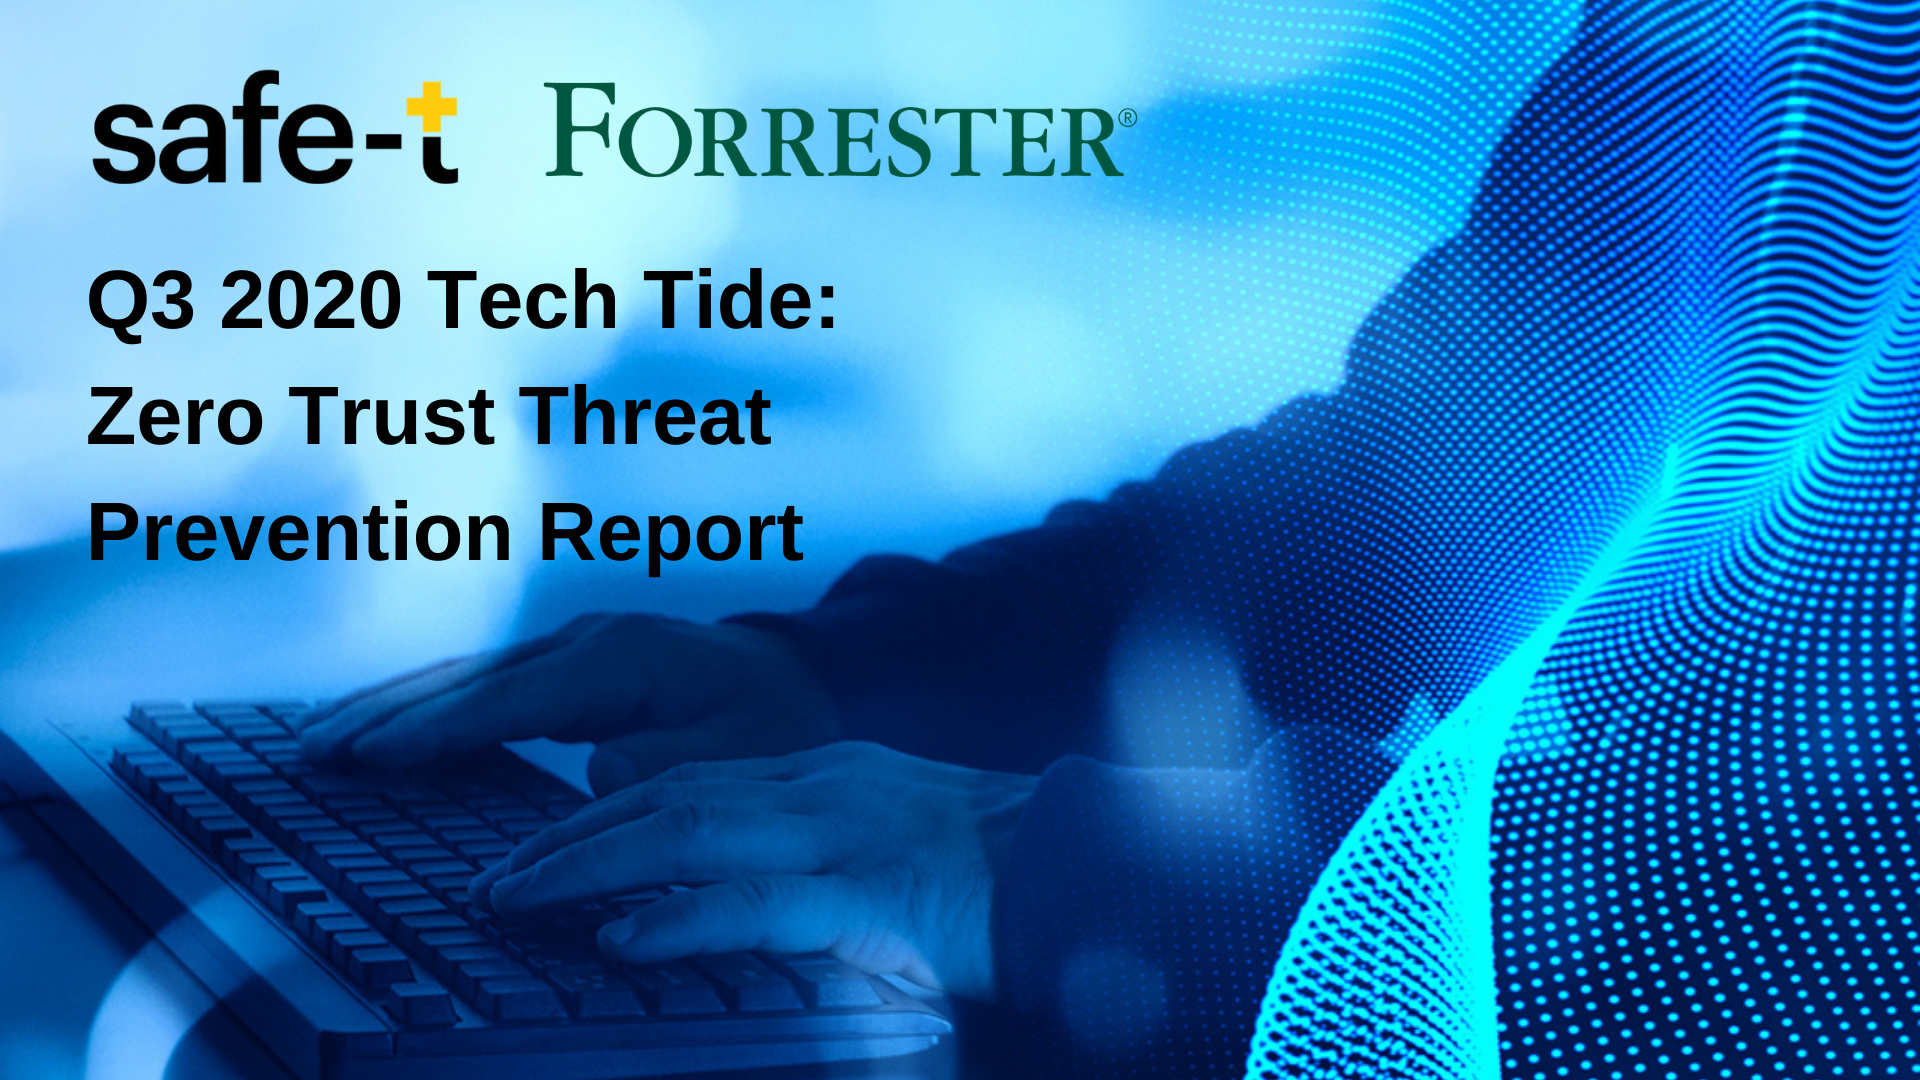 threat prevention report